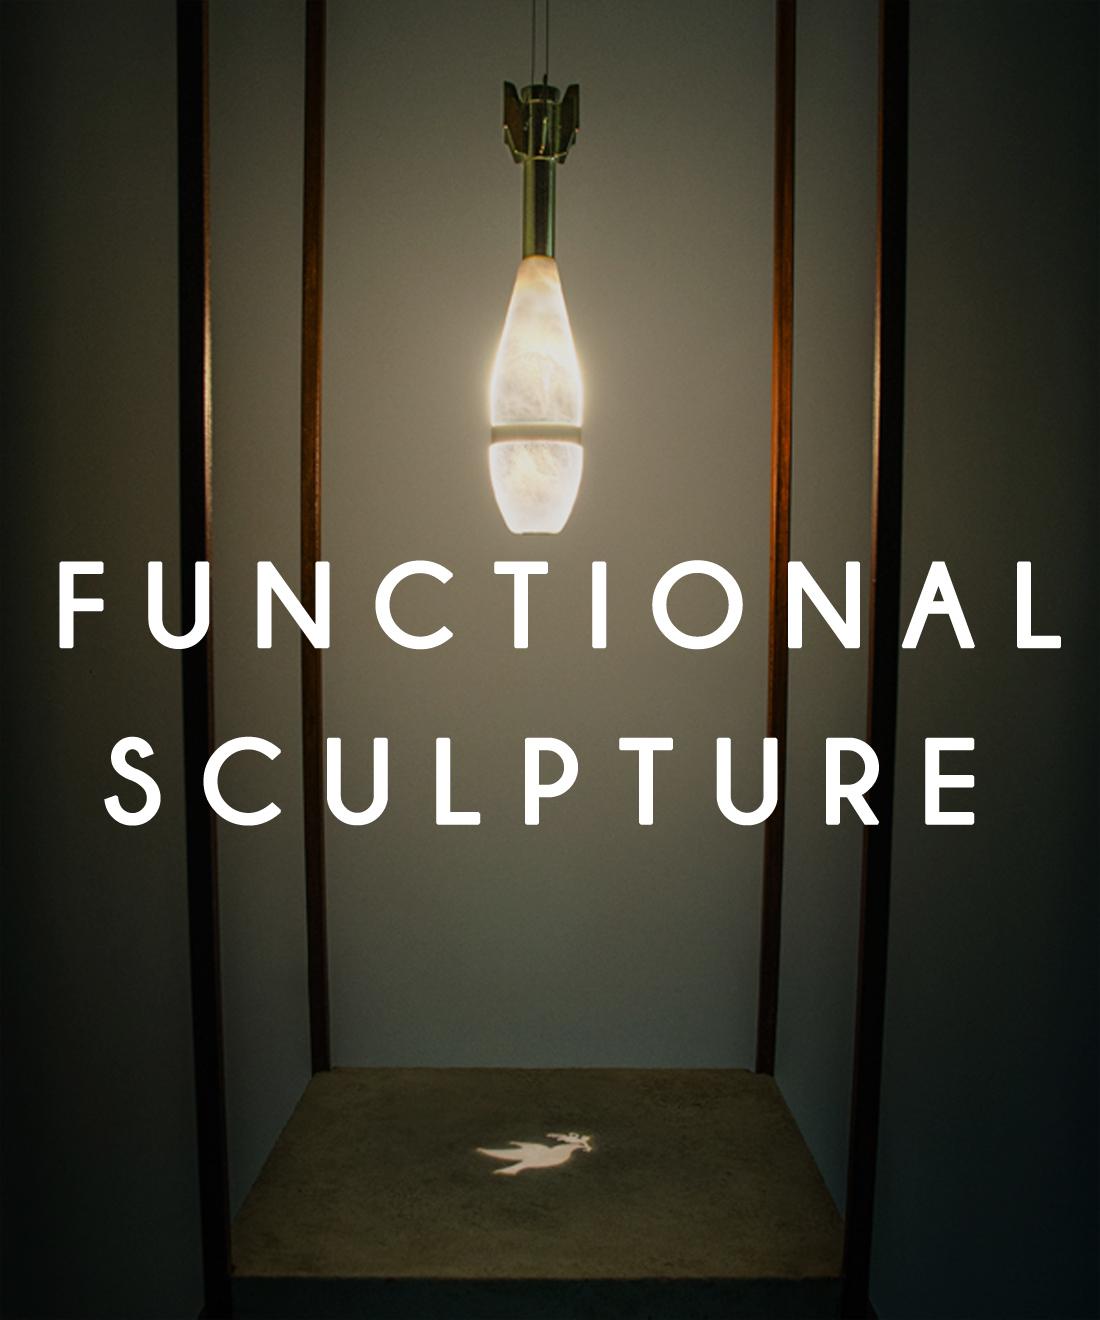 Functional sculpture by Amarist studio